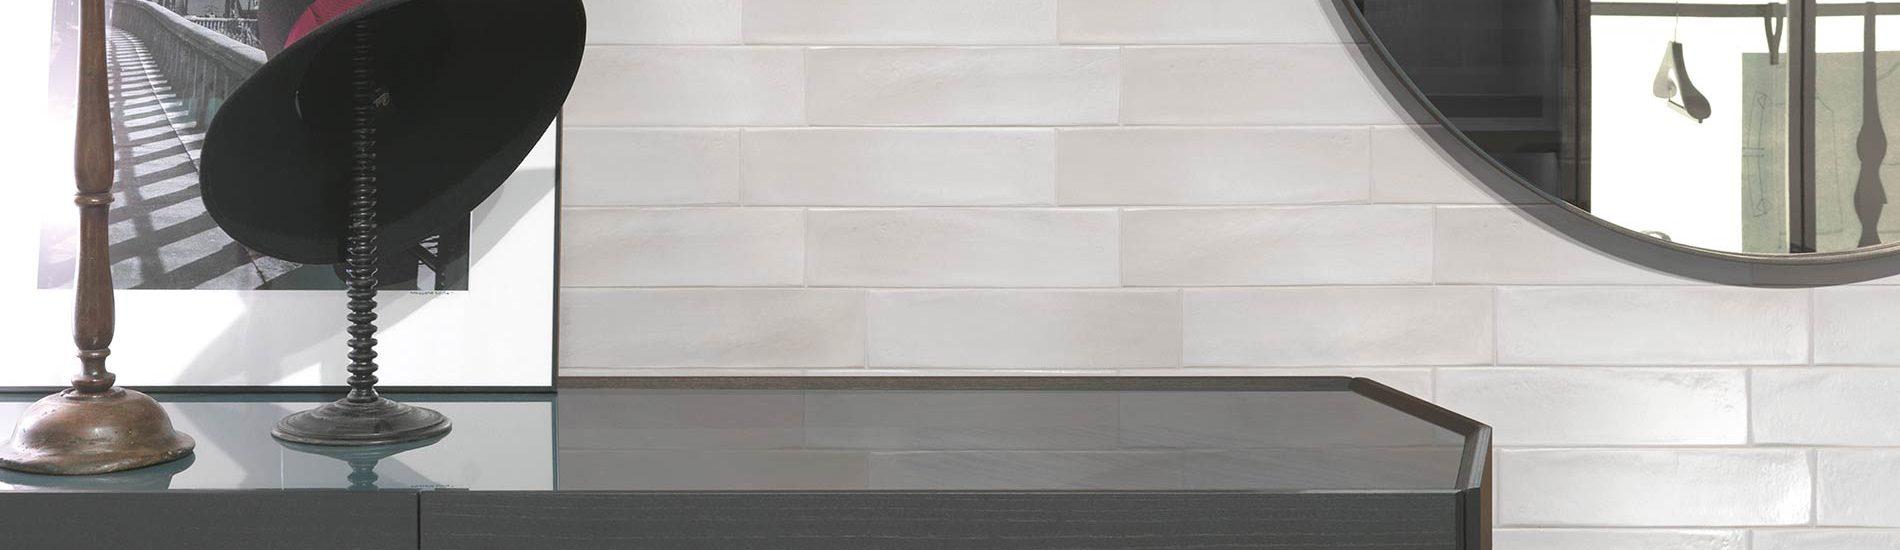 banner-allure-italian-subway-brick-look-wall-tiles-settecento-anaheim